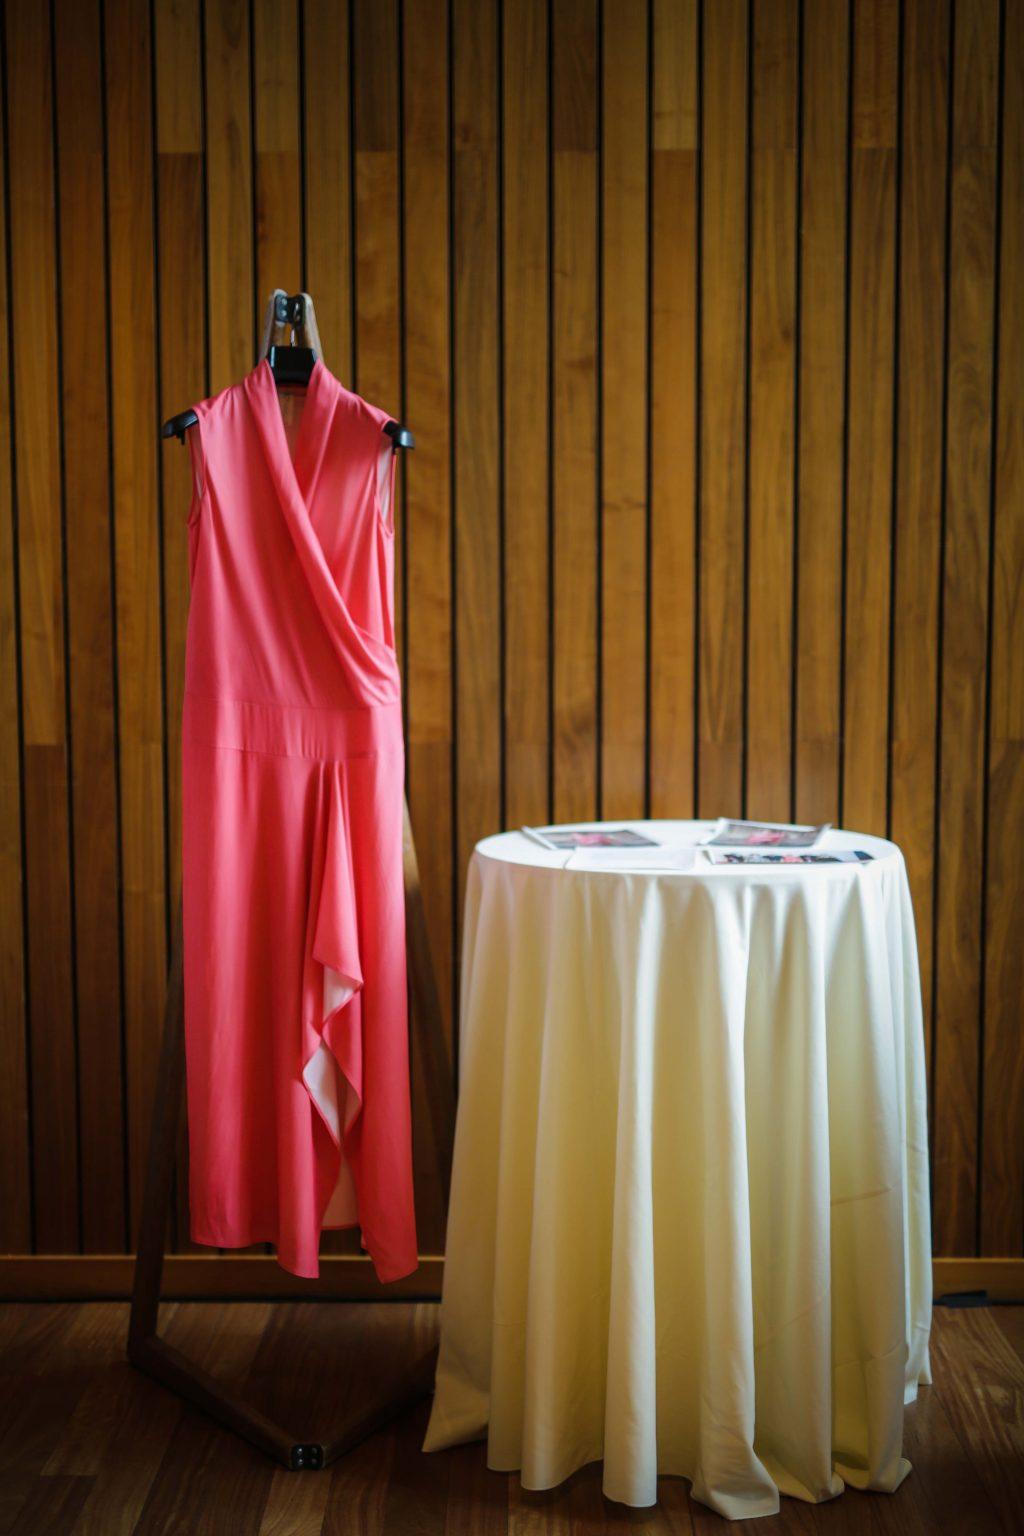 H&M Foundation thời trang bền vững 4